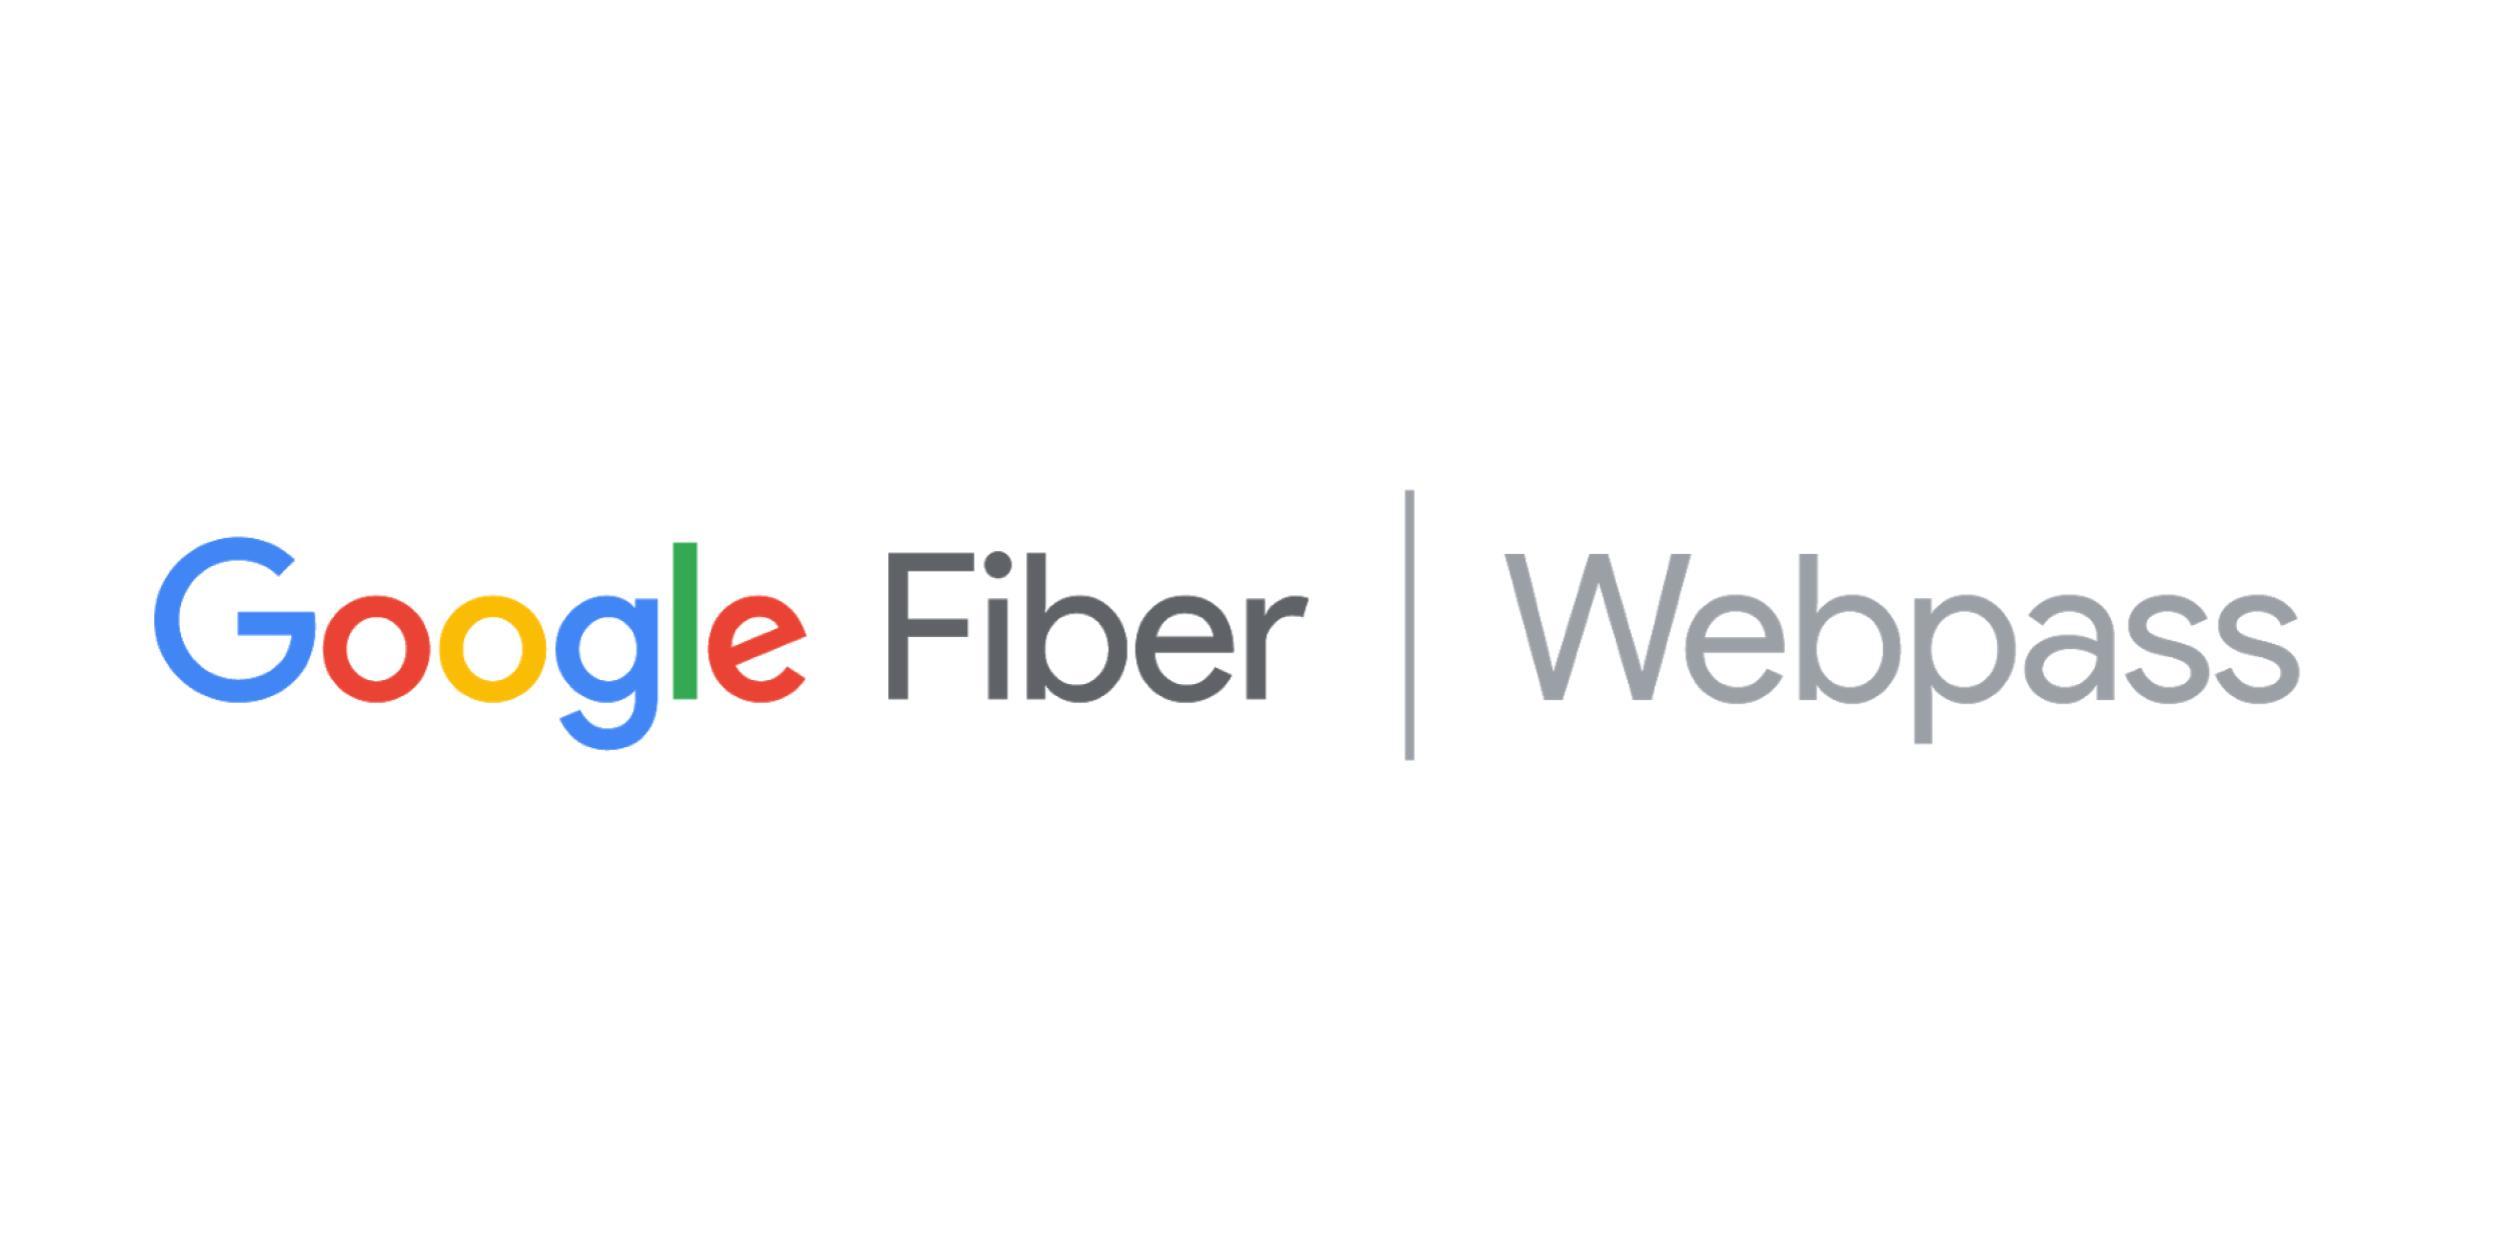 Google Fiber hook up